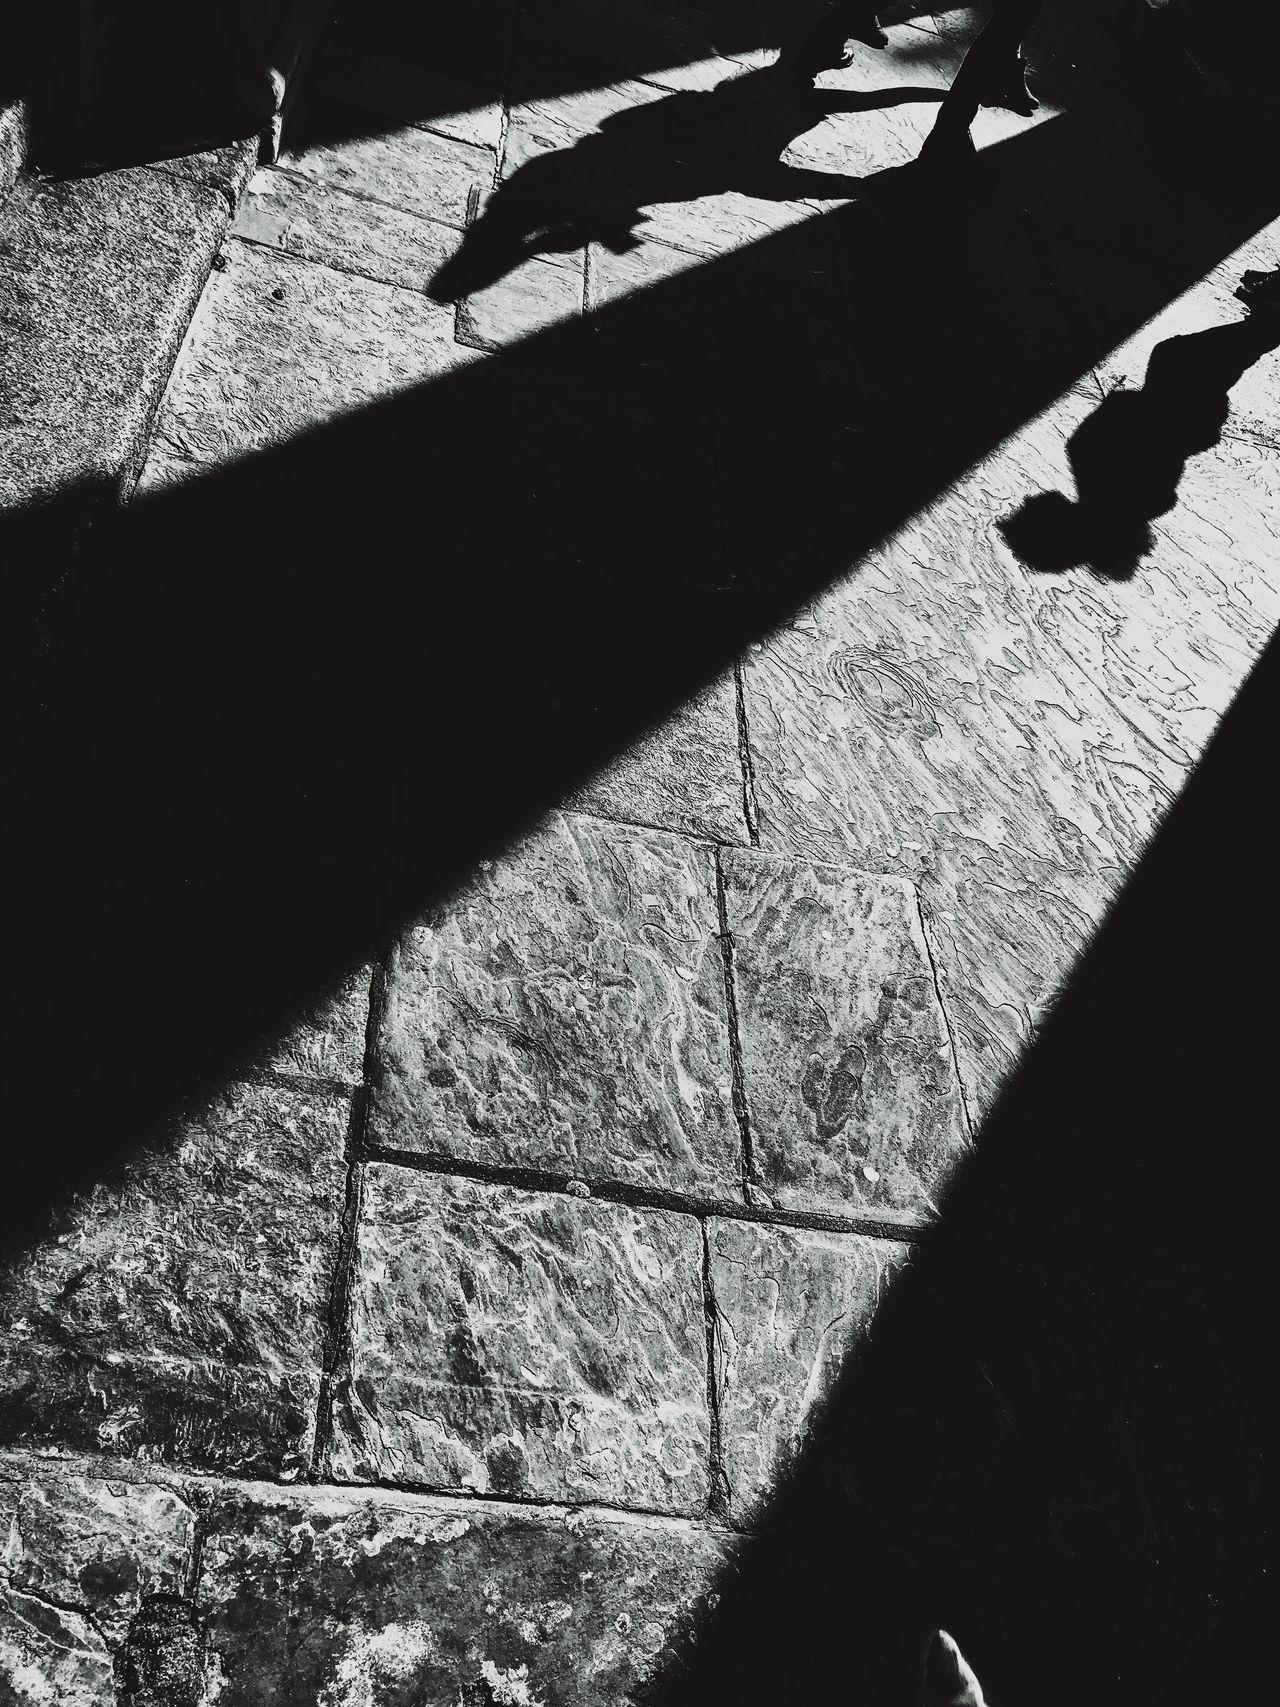 Sillouette Photo Shoot Of A Woman Shadow Stone Columns Pavement City Life EyeEm Best Shots - Architecture Architectural Feature Architecture EyeEm Best Shots - The Streets Fine Art Photography Central London EyeEm Best Shots EyeEmBestPics Creativity Fine Art Fresh On Eyeem  Street Photography Urban Exploration The Week Of Eyeem Abstract Photography Shadow And Light Focus On Shadow Abstract Eyeemphotography